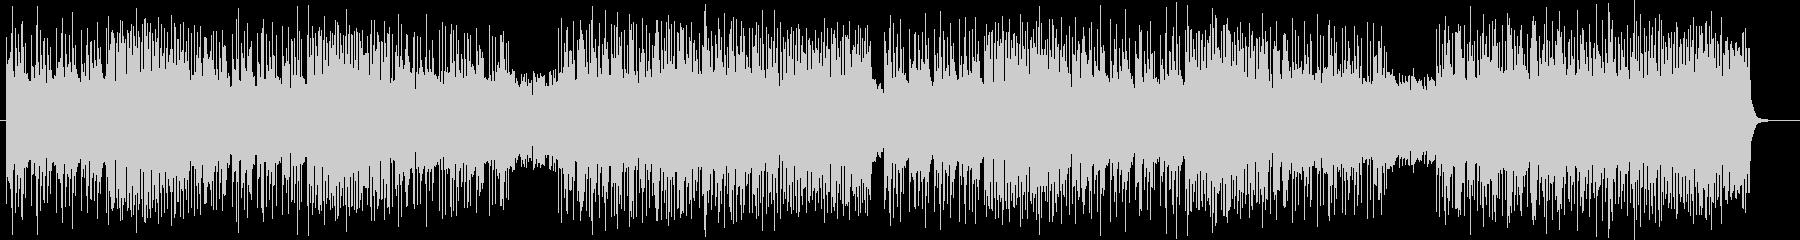 「HR/HM」「DEATH」BGM310の未再生の波形